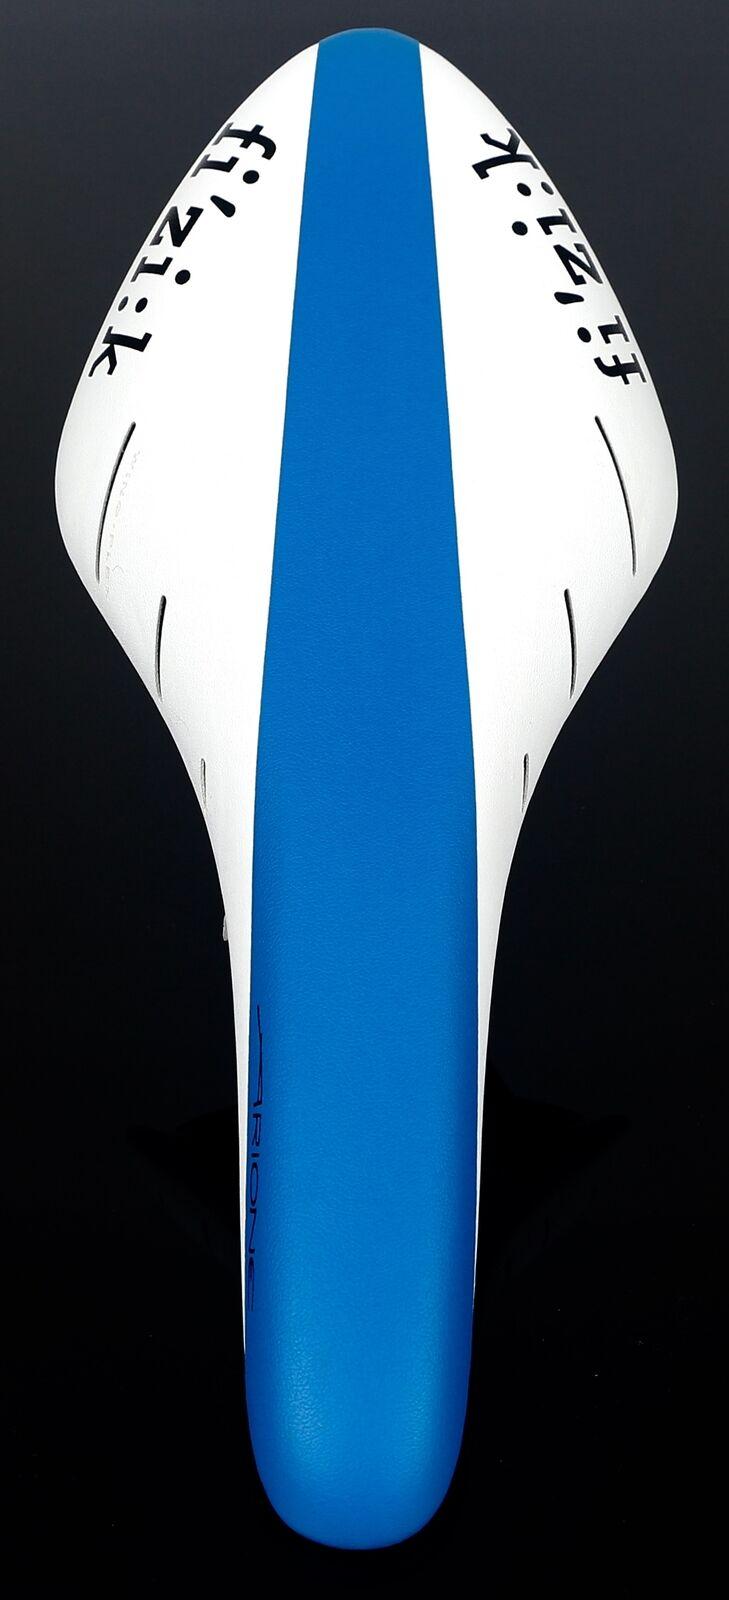 FI'ZI K Fizik Arione R3 Kium  7 mm Rail Road Saddle, Azul blancoo Nuevo